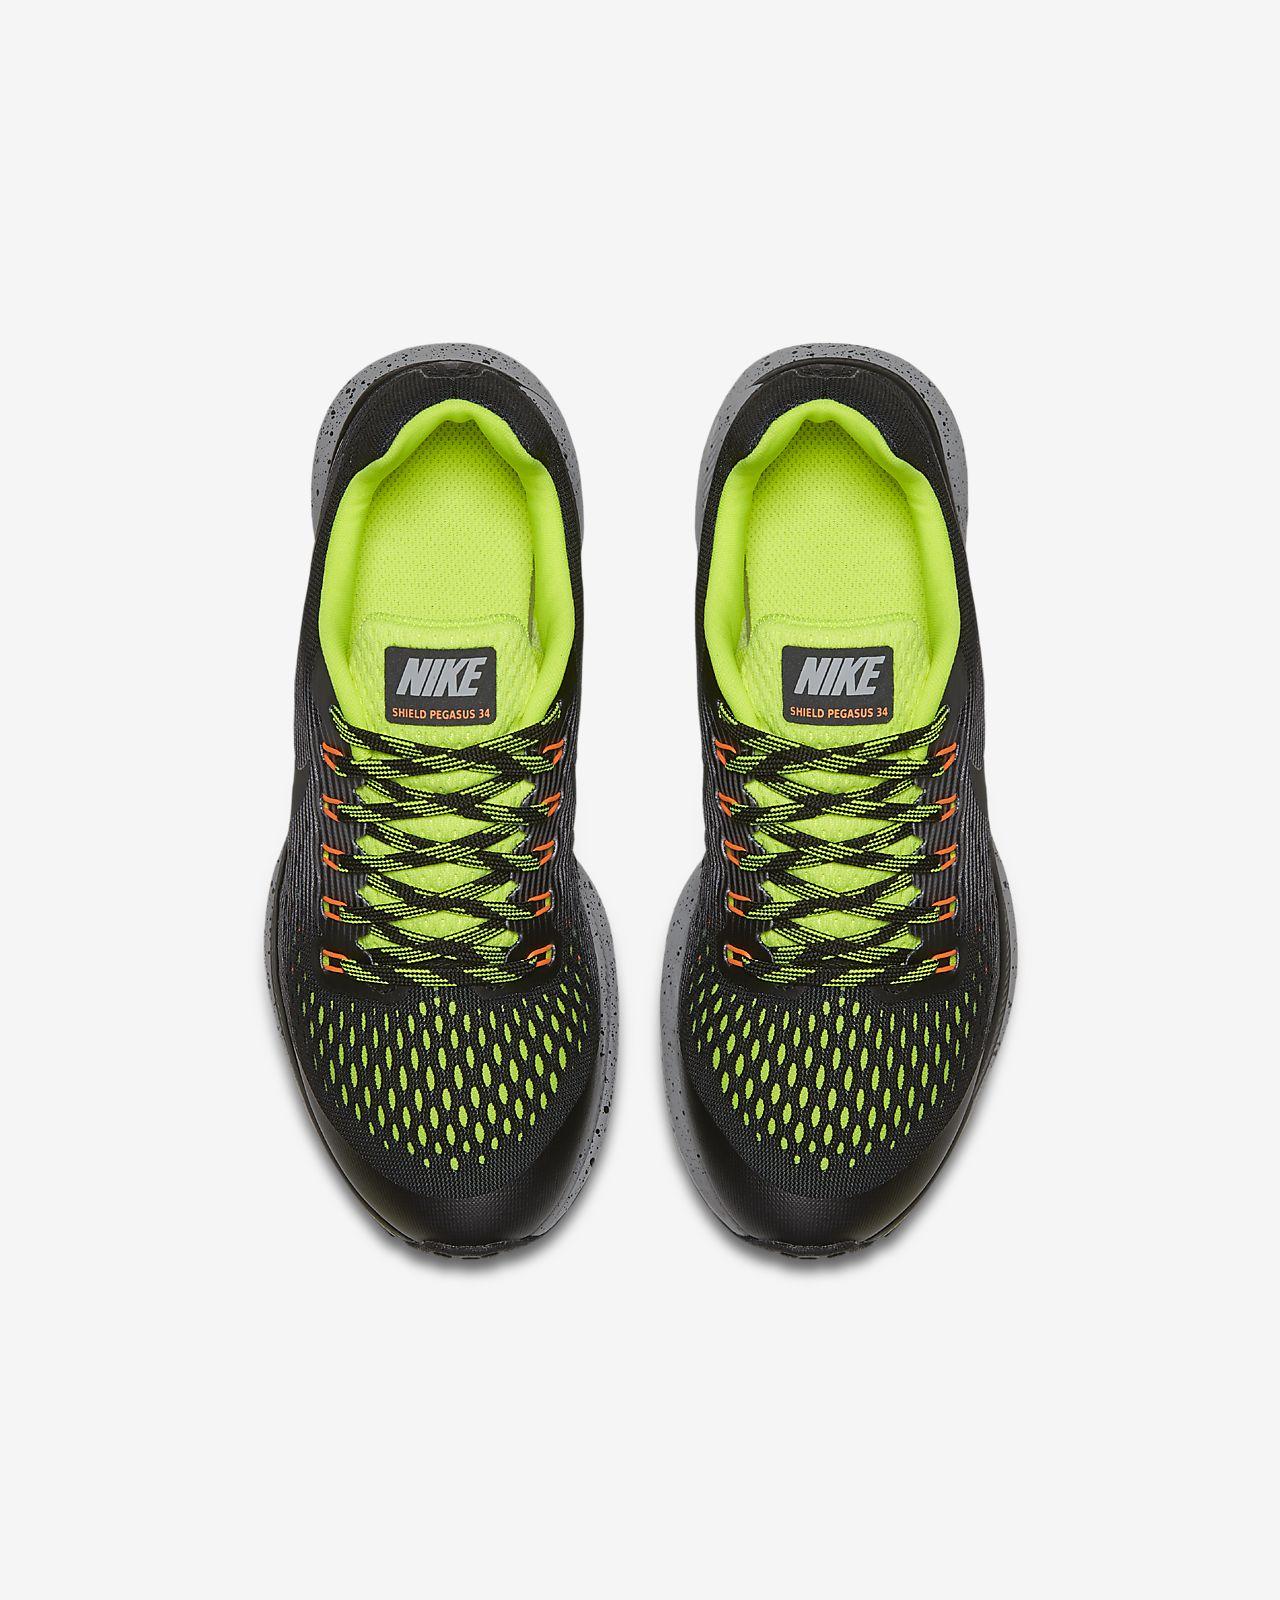 scarpe da donna nike shield pegasus 34